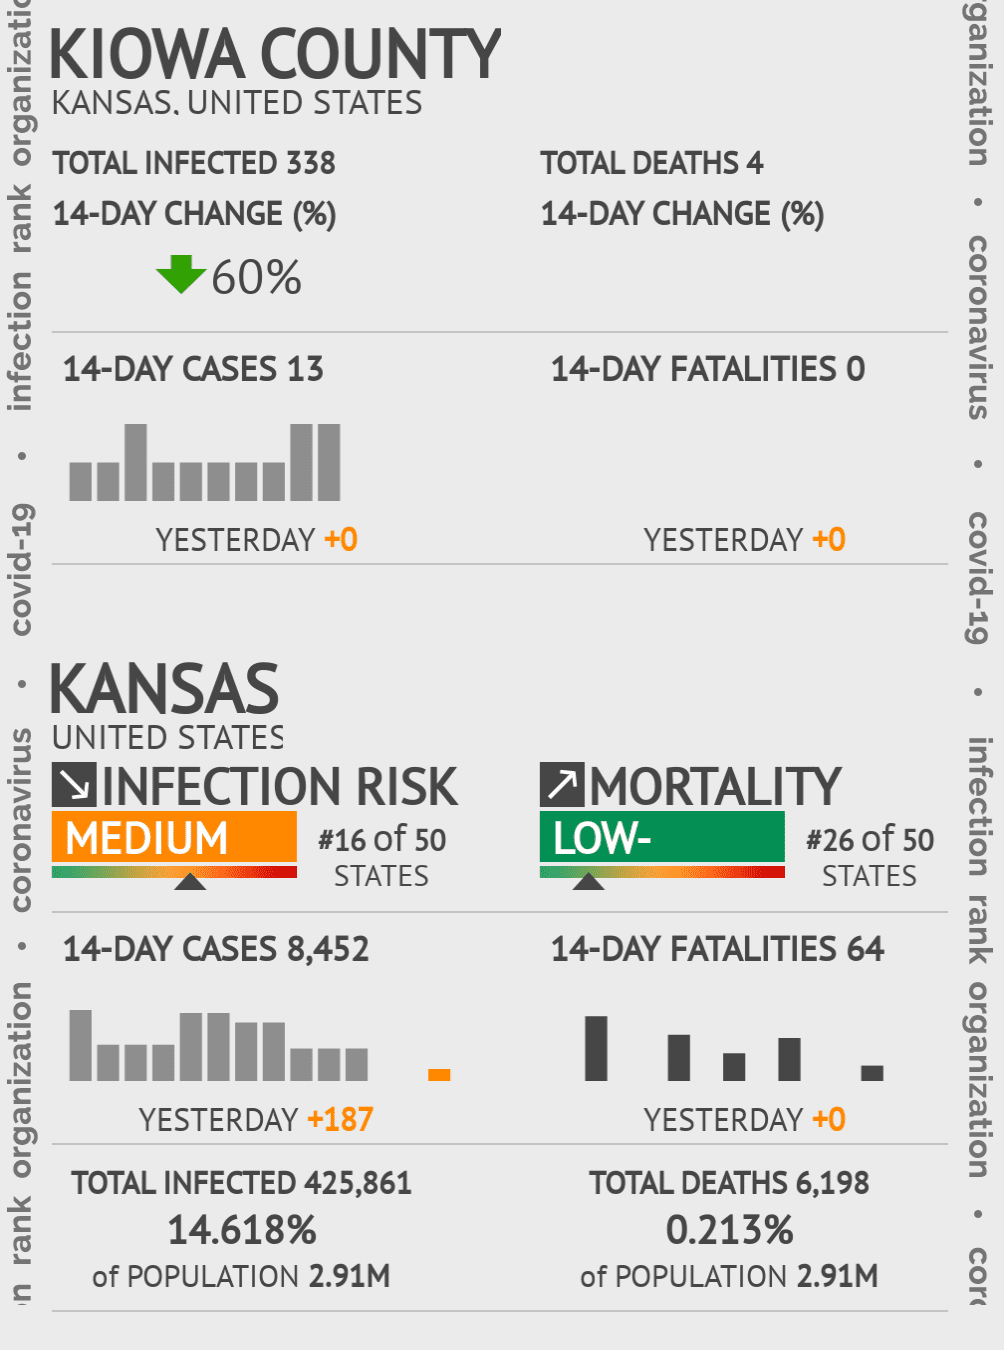 Kiowa County Coronavirus Covid-19 Risk of Infection on July 24, 2021